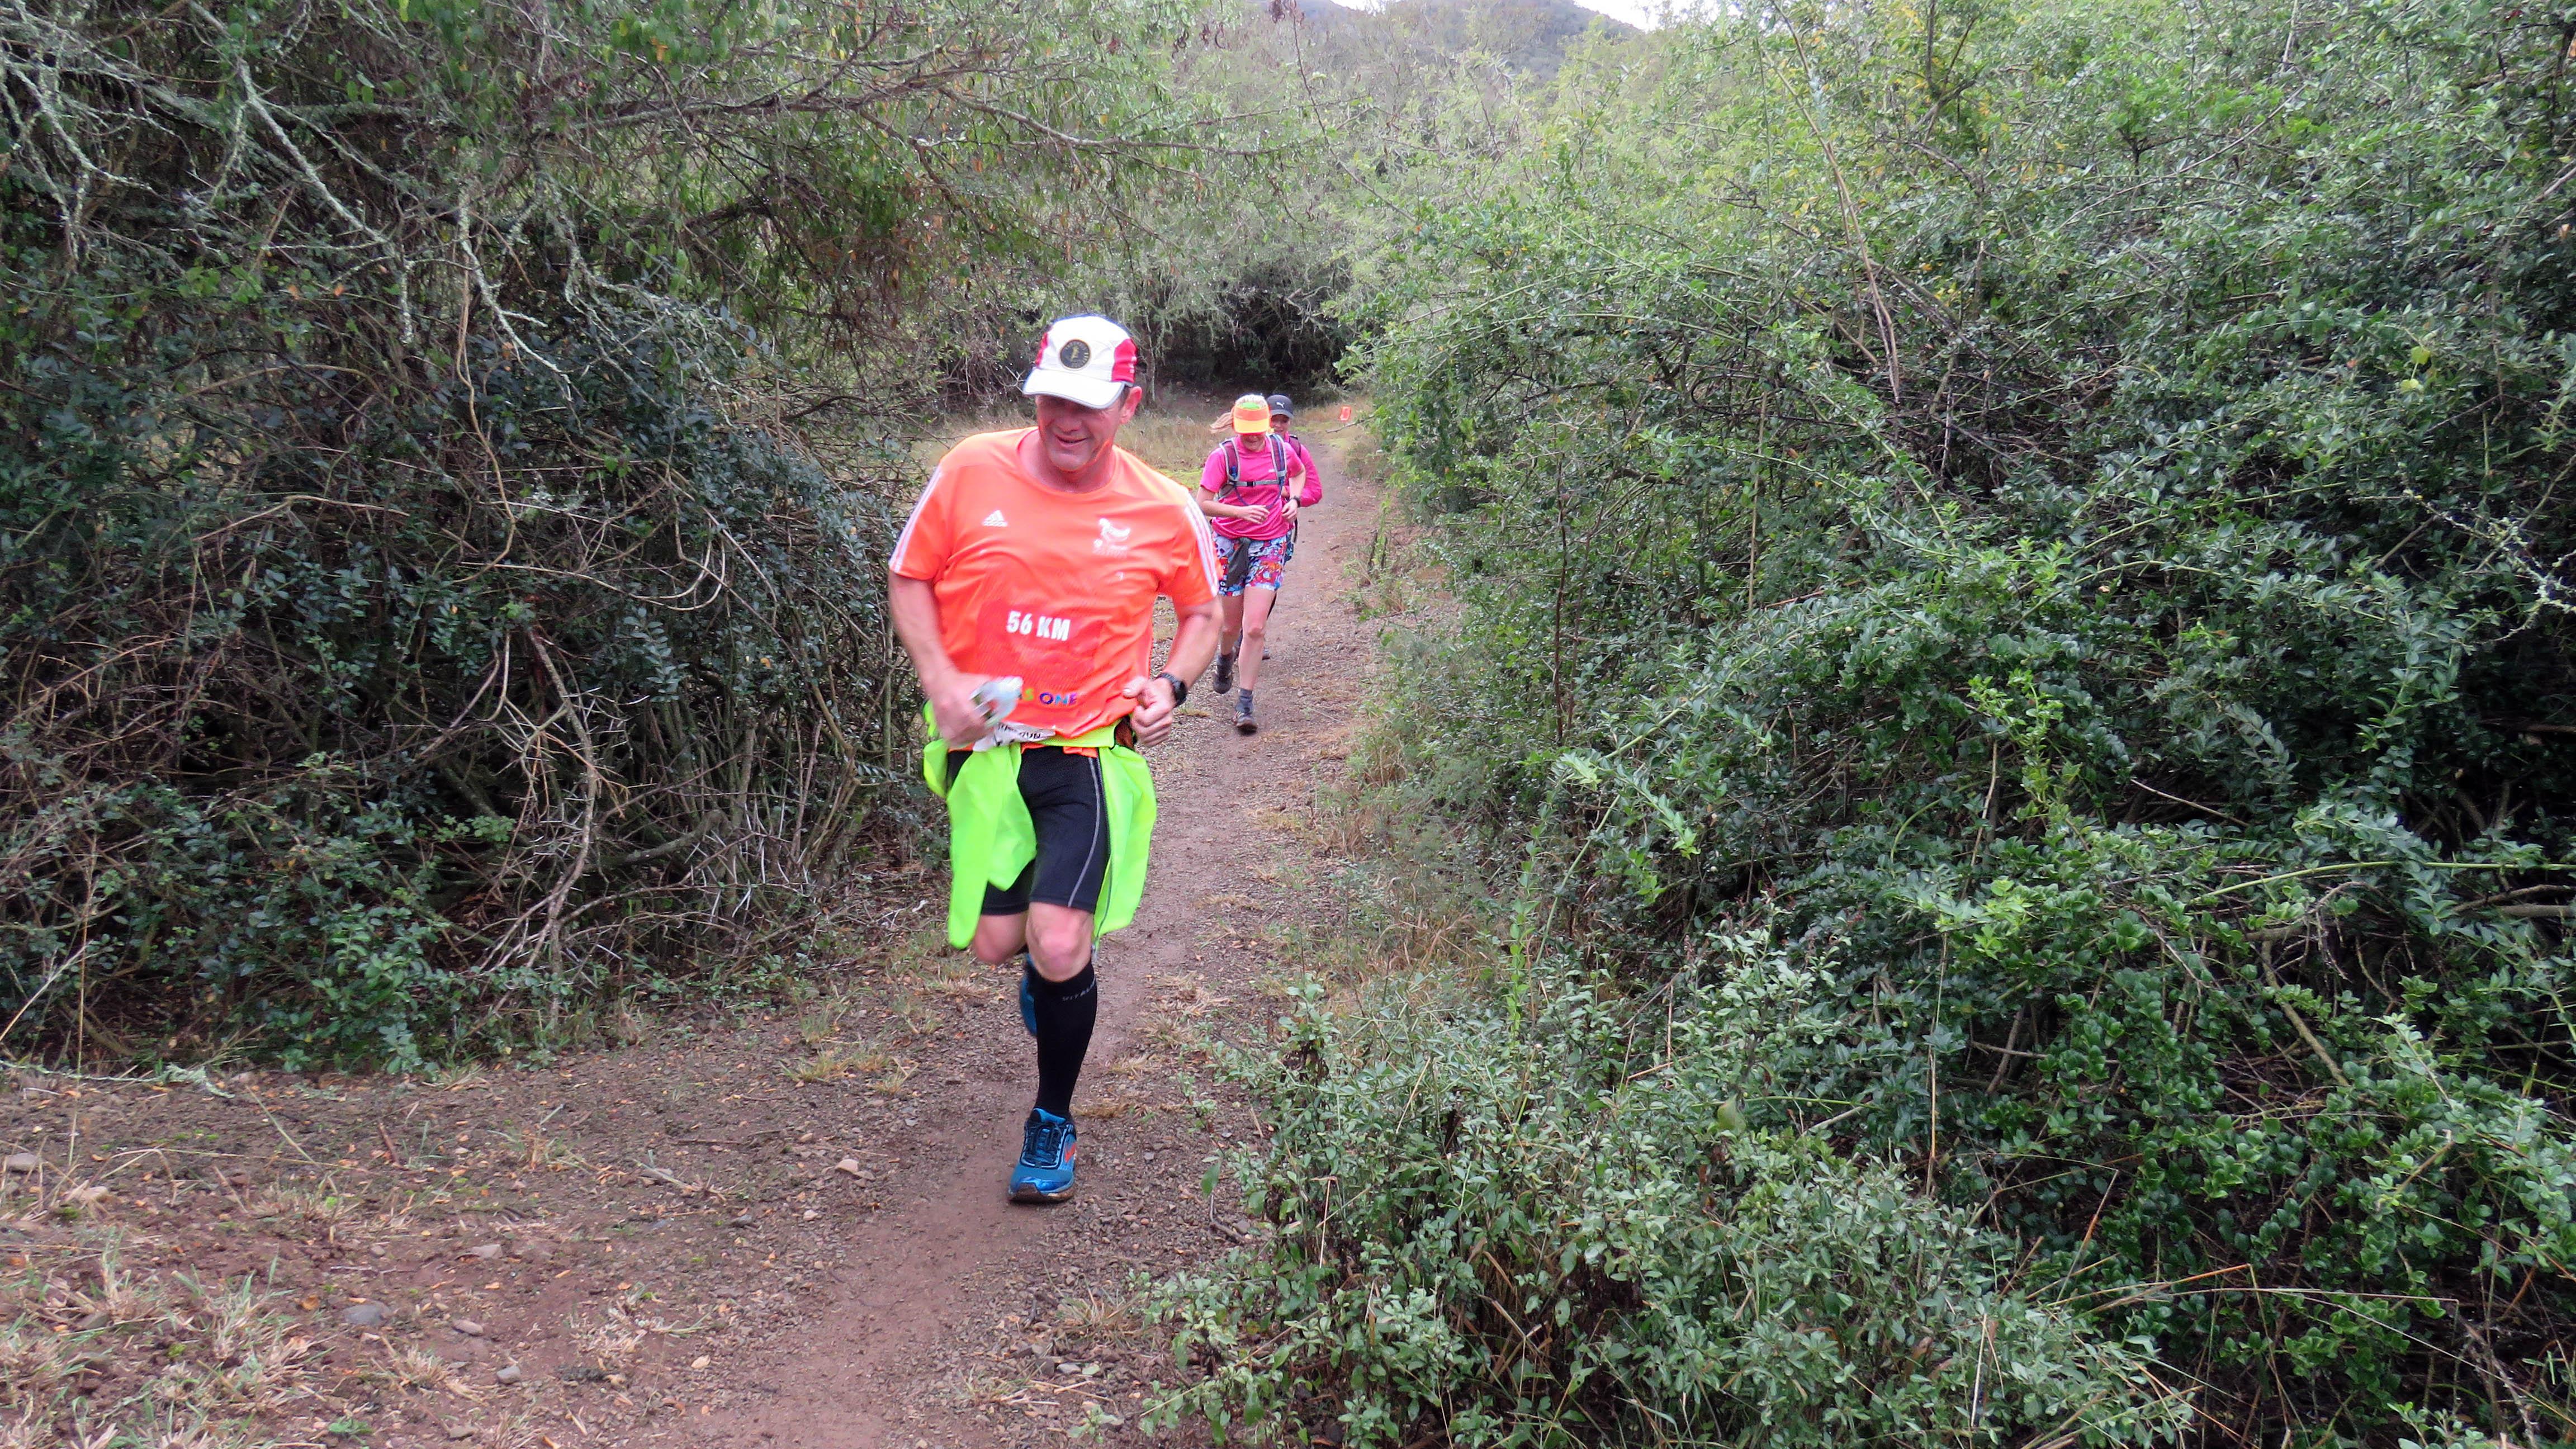 hayterdale trailrun 2018-08-05  (70)